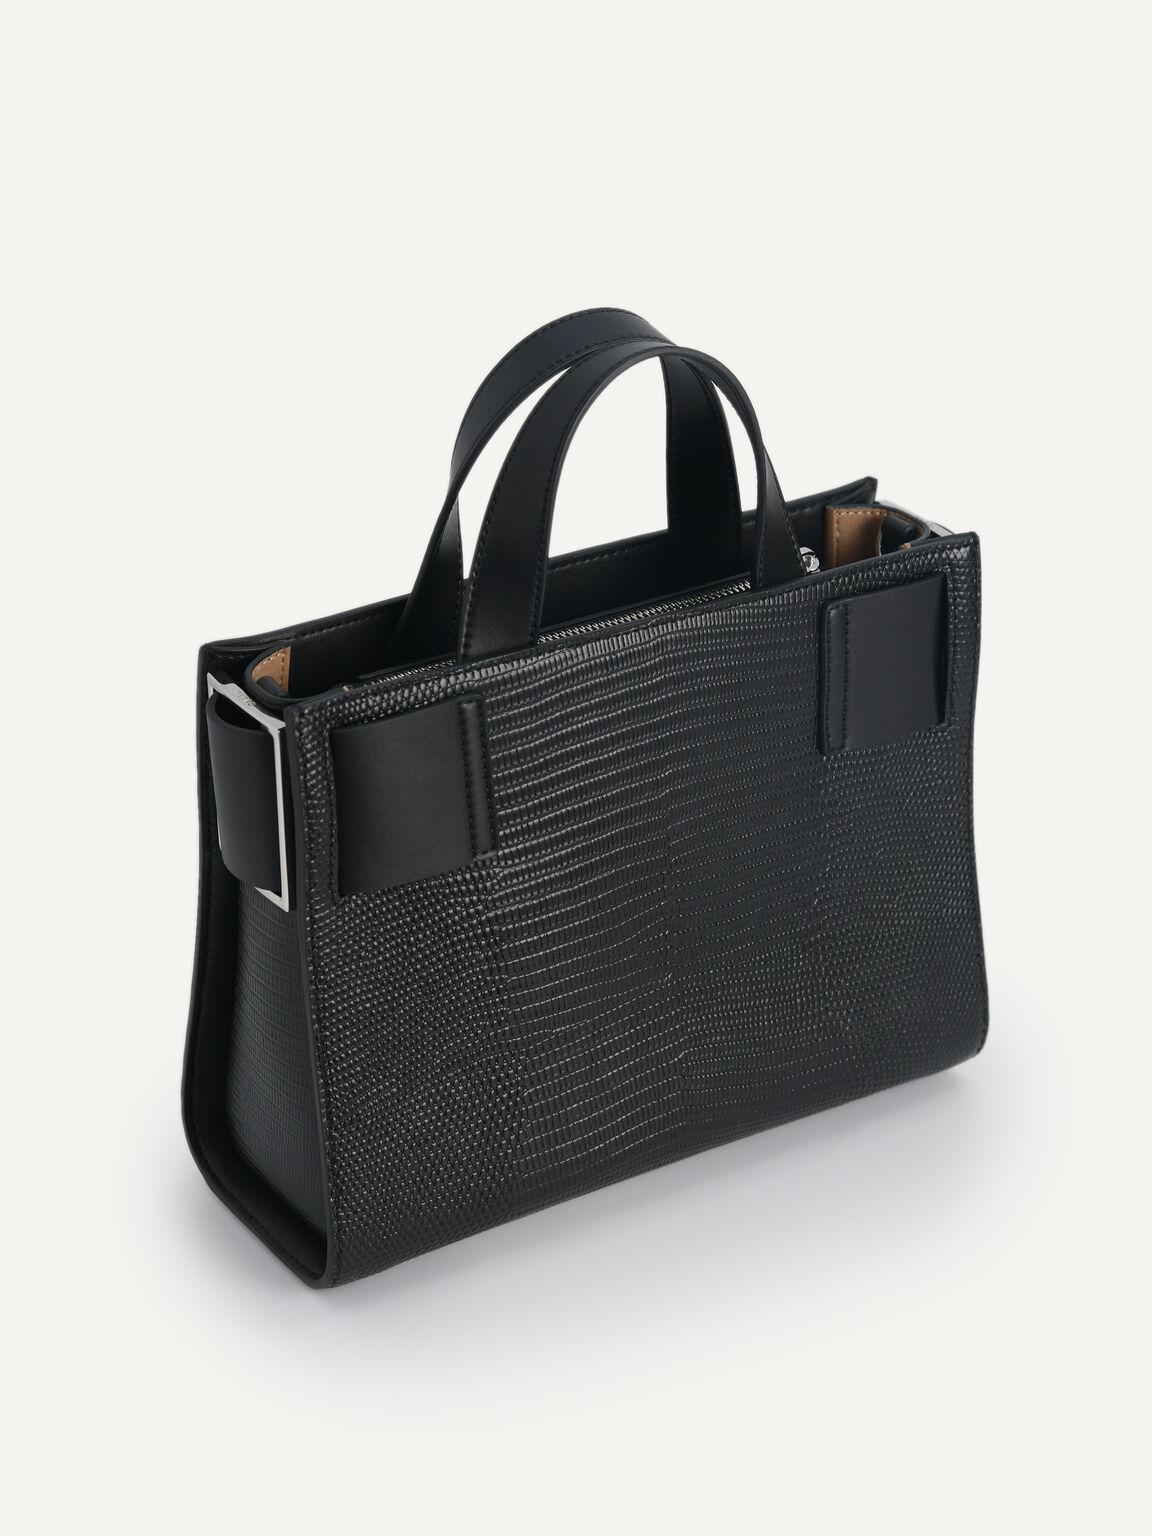 Lizard-Effect Leather Top Handle Bag, Black, hi-res